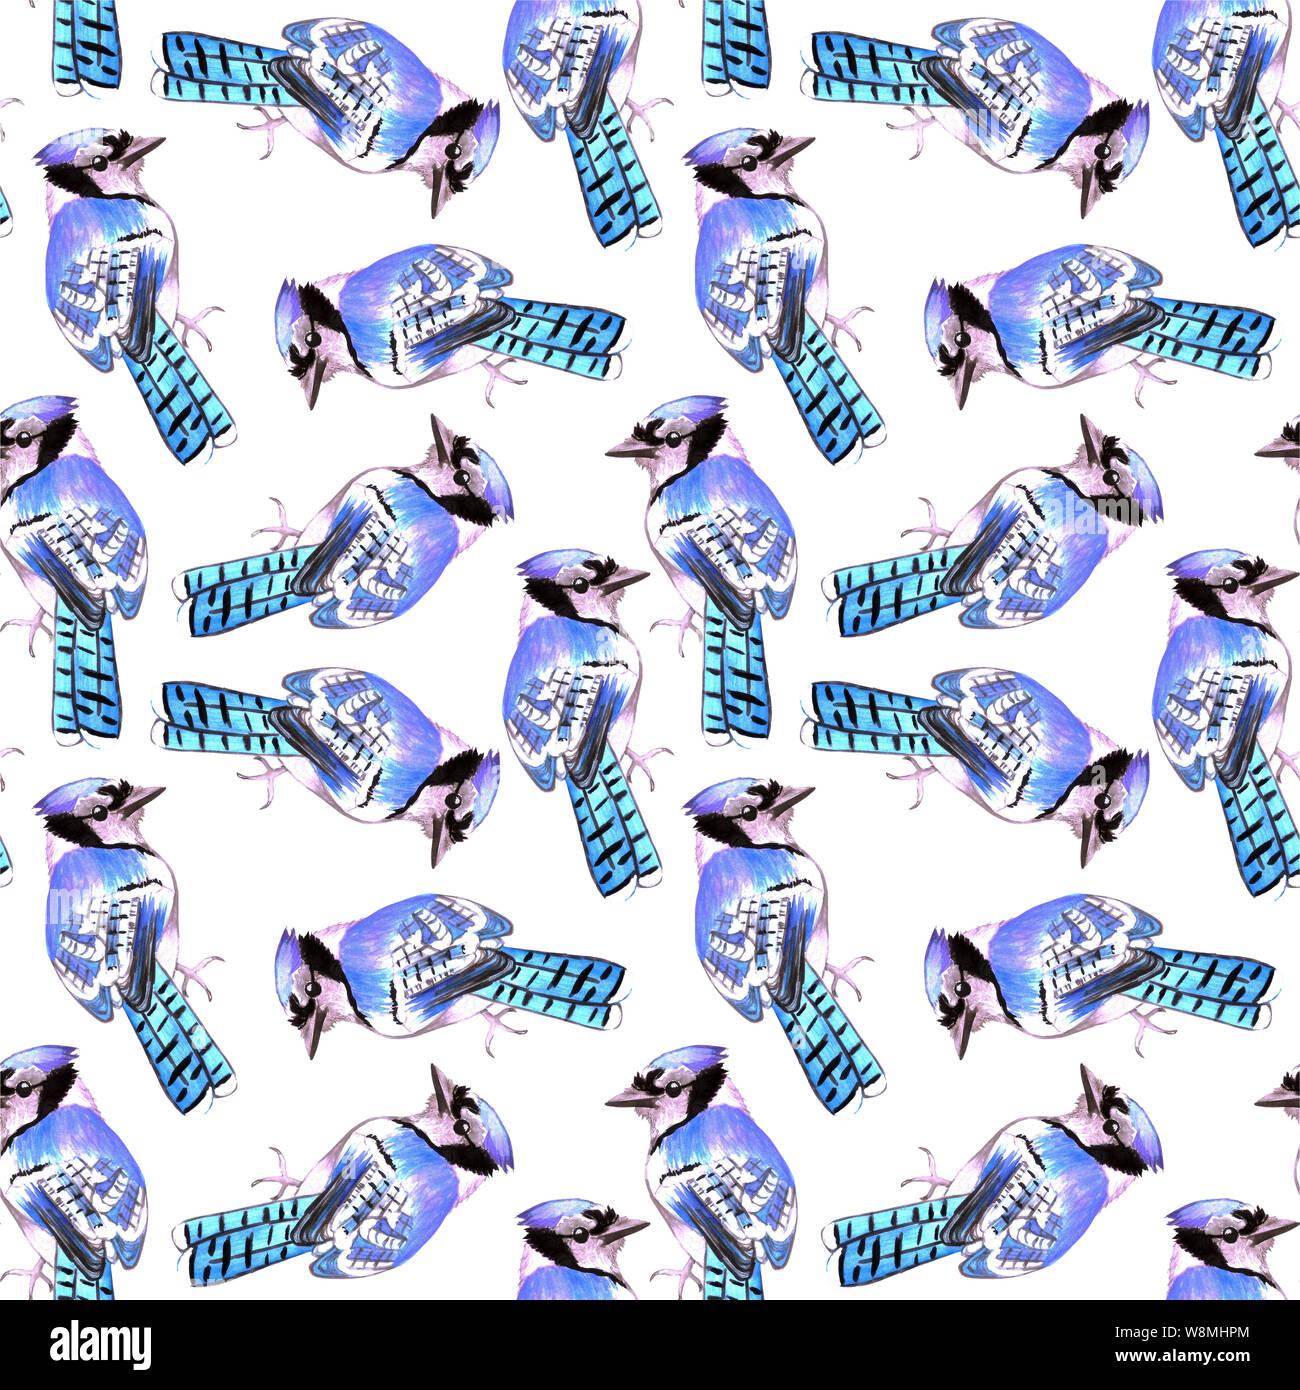 Blue Jay or Cyanocitta cristata bird seamless watercolor birds painting background Stock Photo